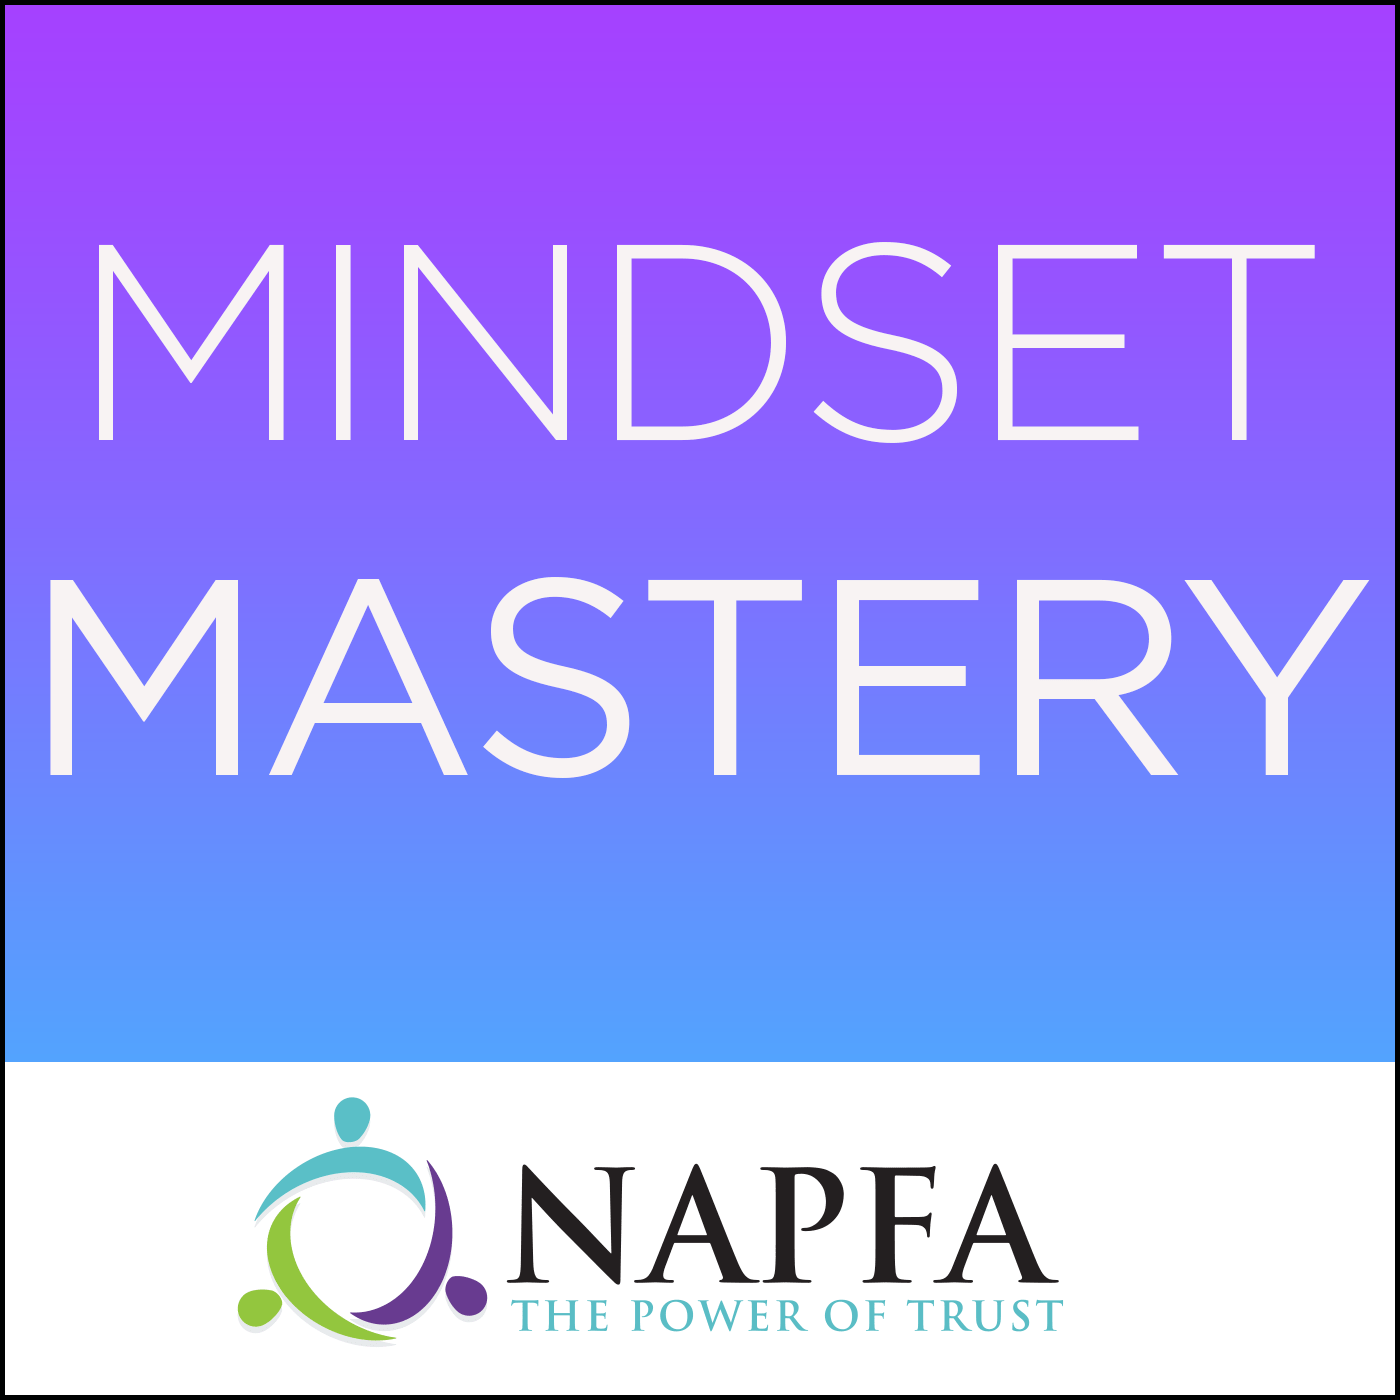 Mindset Master Podcast Cover